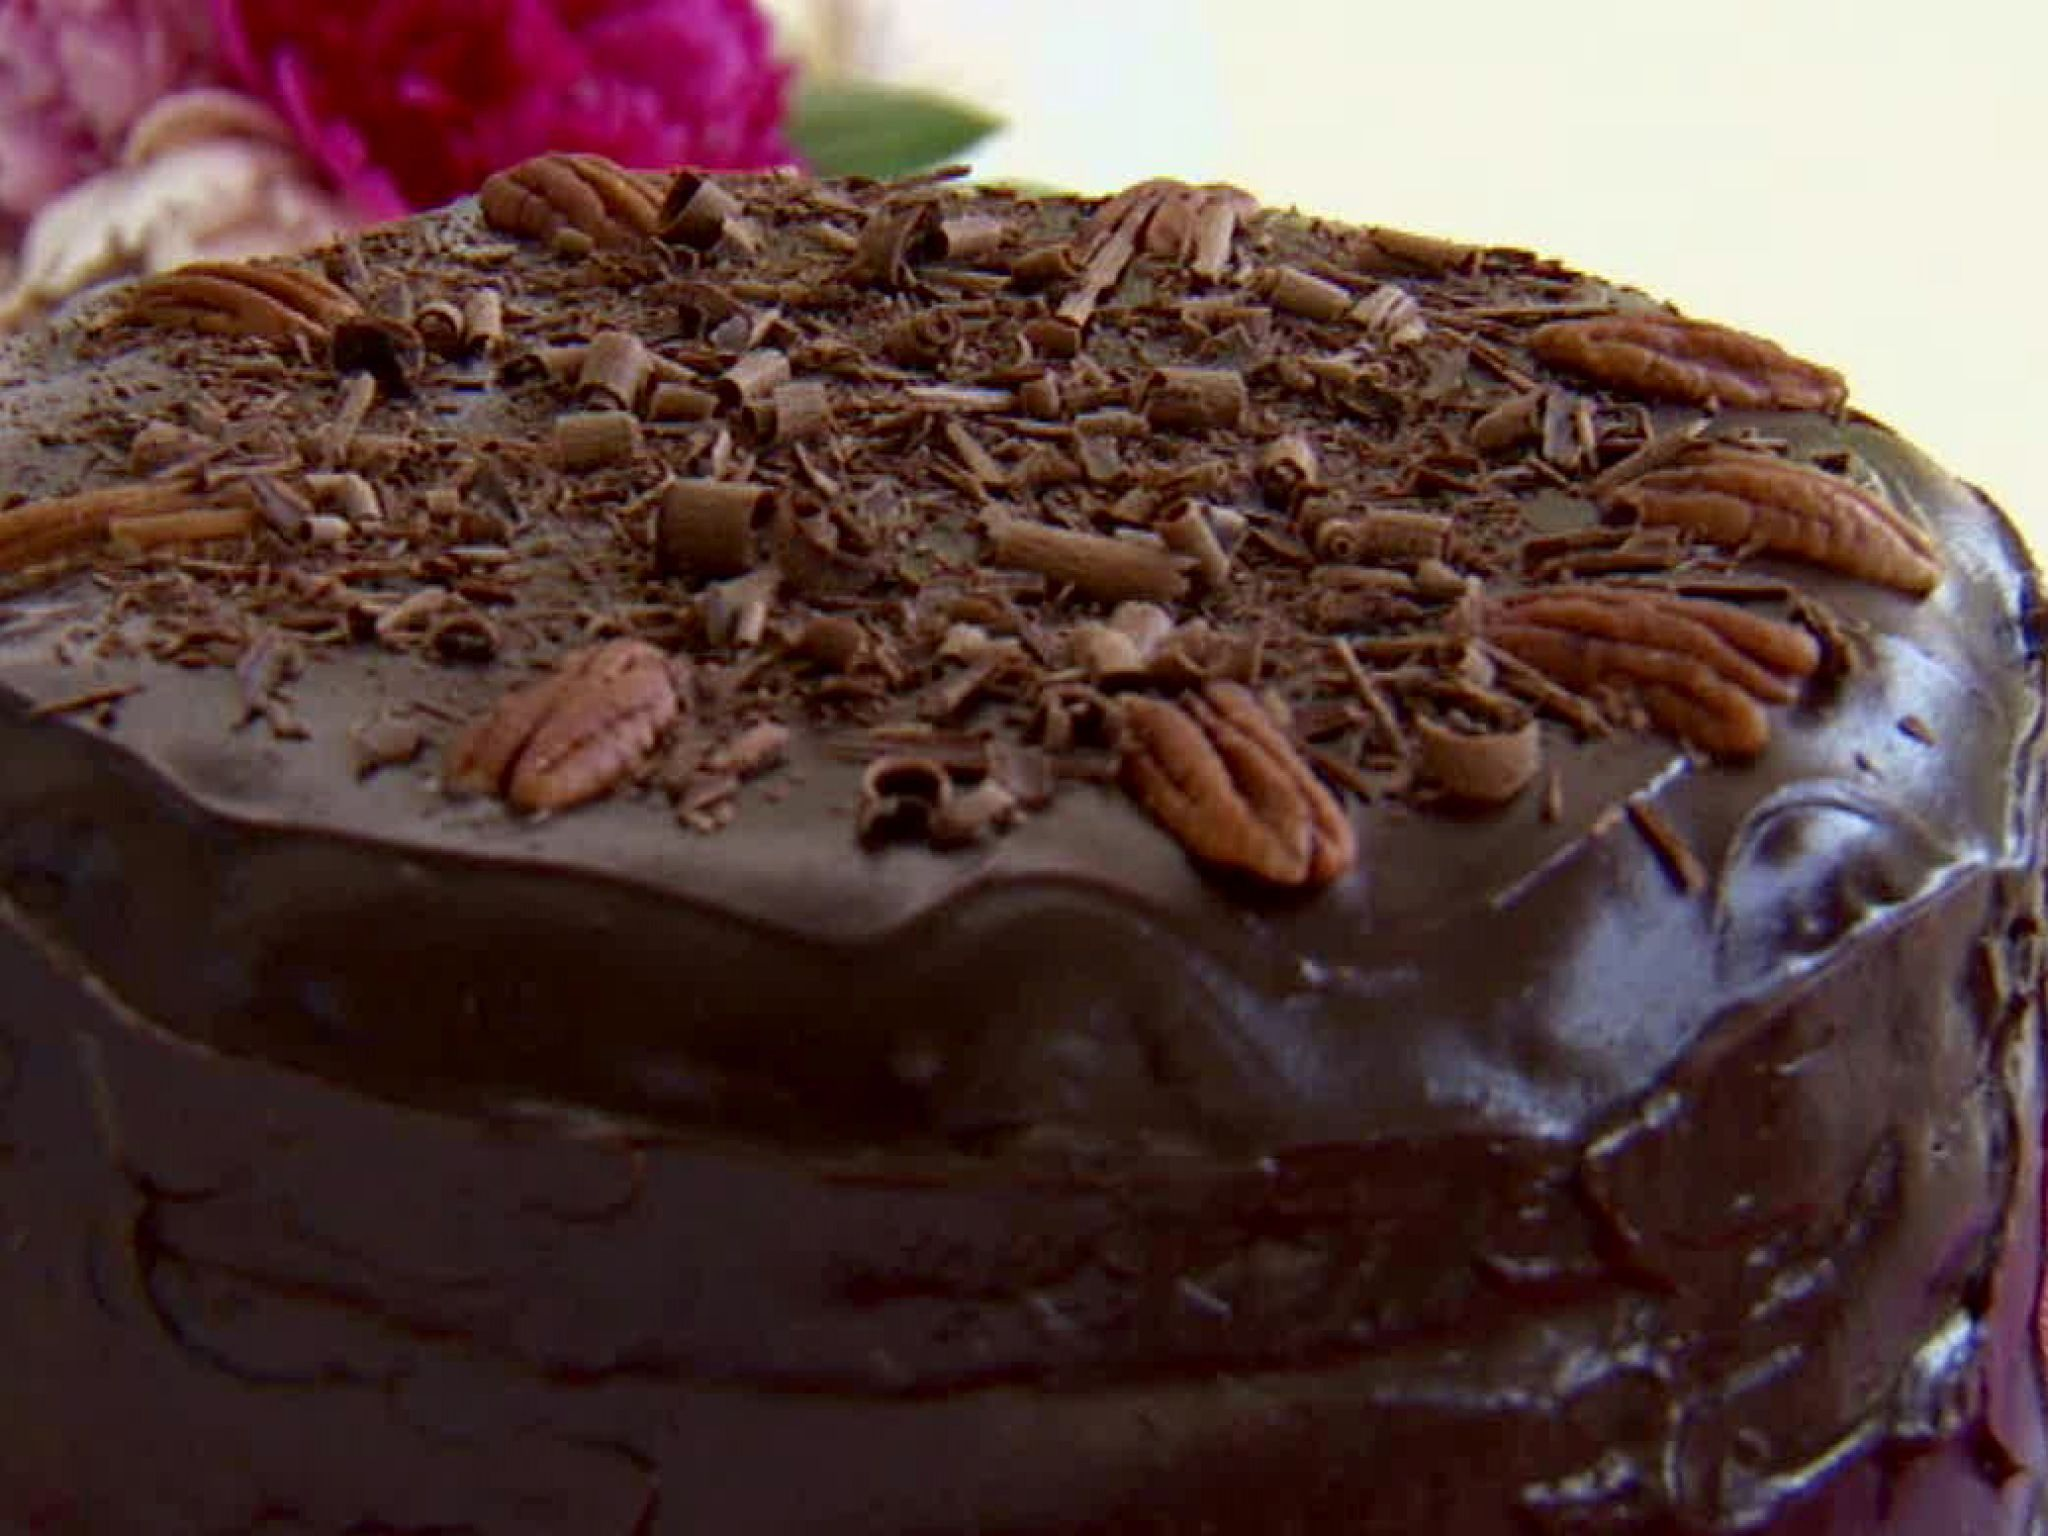 German Chocolate Cake With Coconut Pecan Filling Paula Deen Food Network Pecan Filling Recipe Filling Recipes German Chocolate Cake